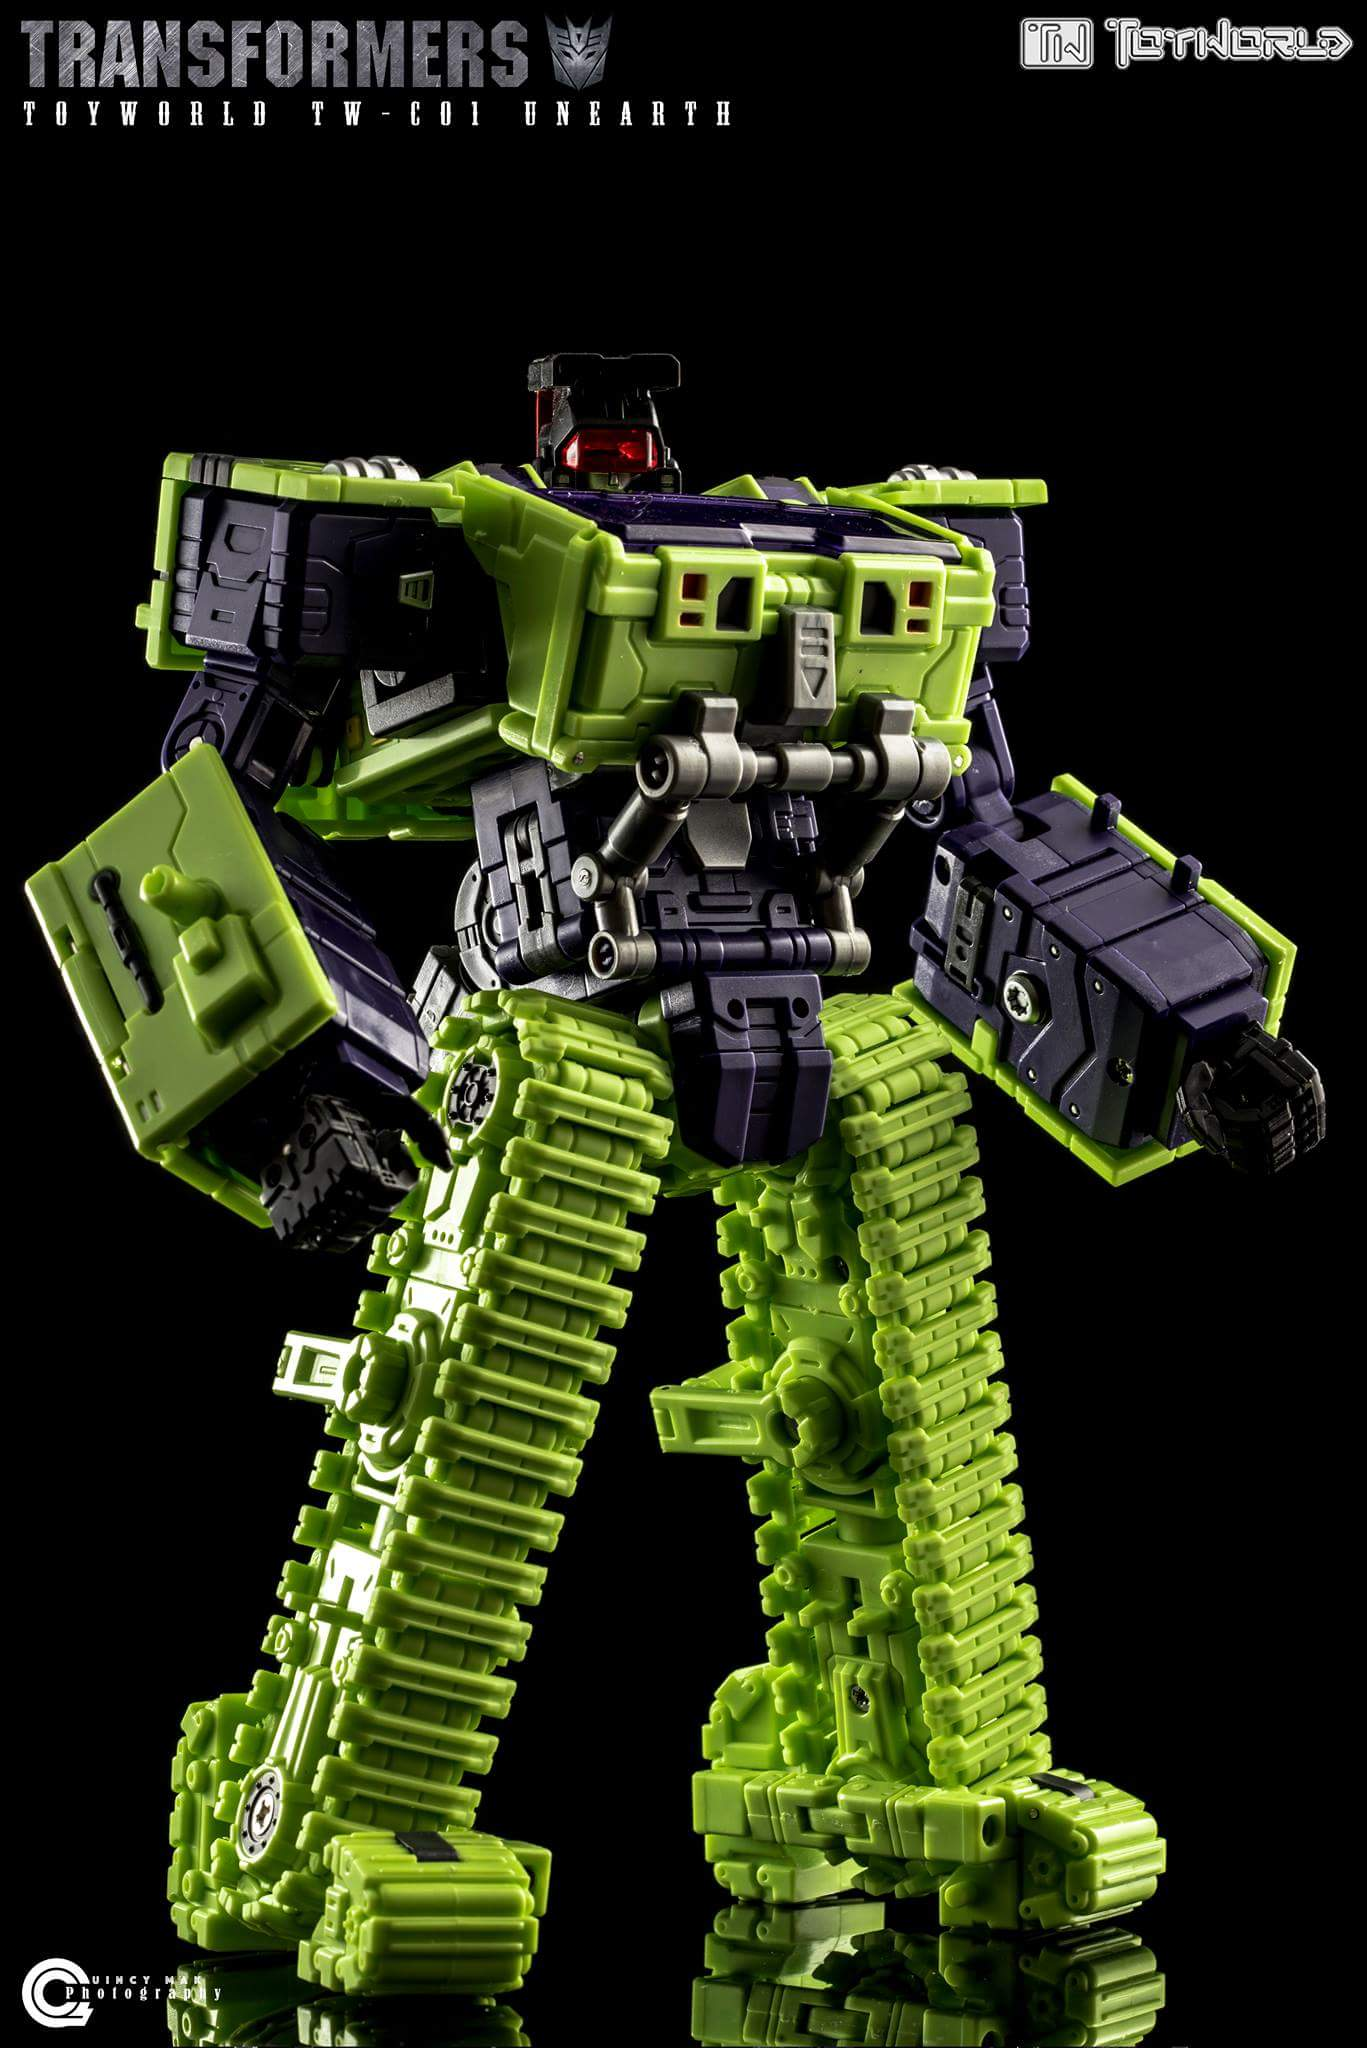 [Toyworld] Produit Tiers - Jouet TW-C Constructor aka Devastator/Dévastateur (Version vert G1 et jaune G2) - Page 4 2xzlLXDl